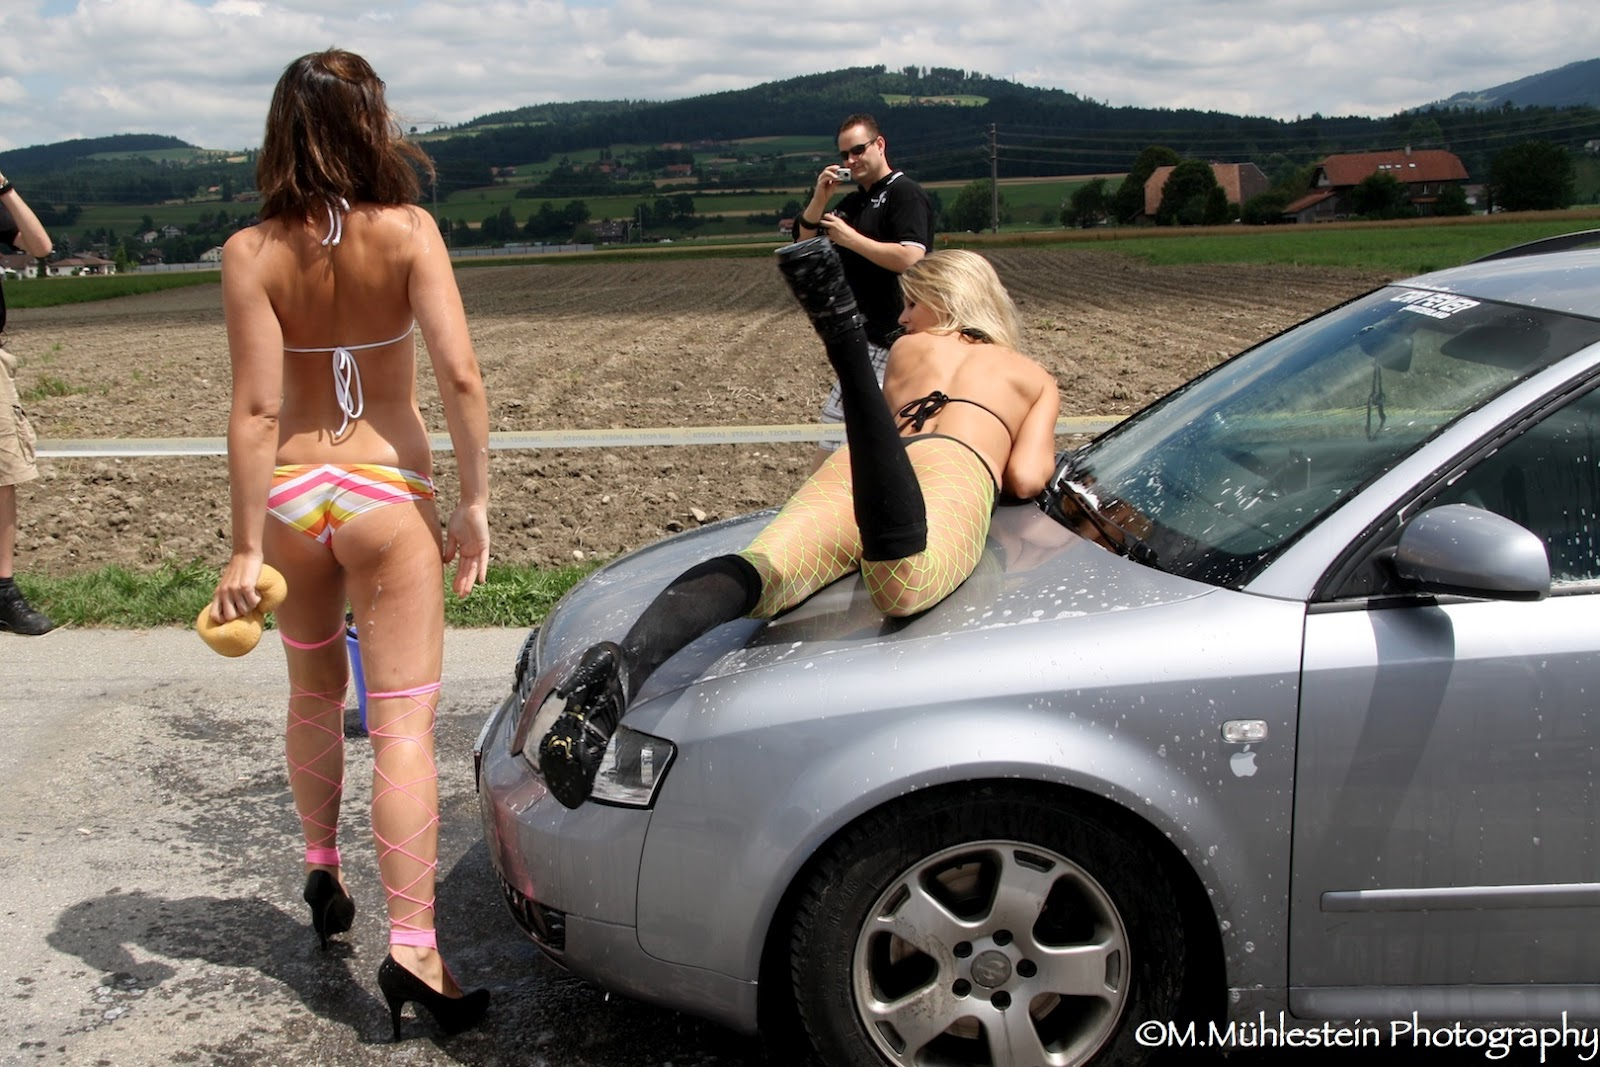 Hot sexy girls car wash